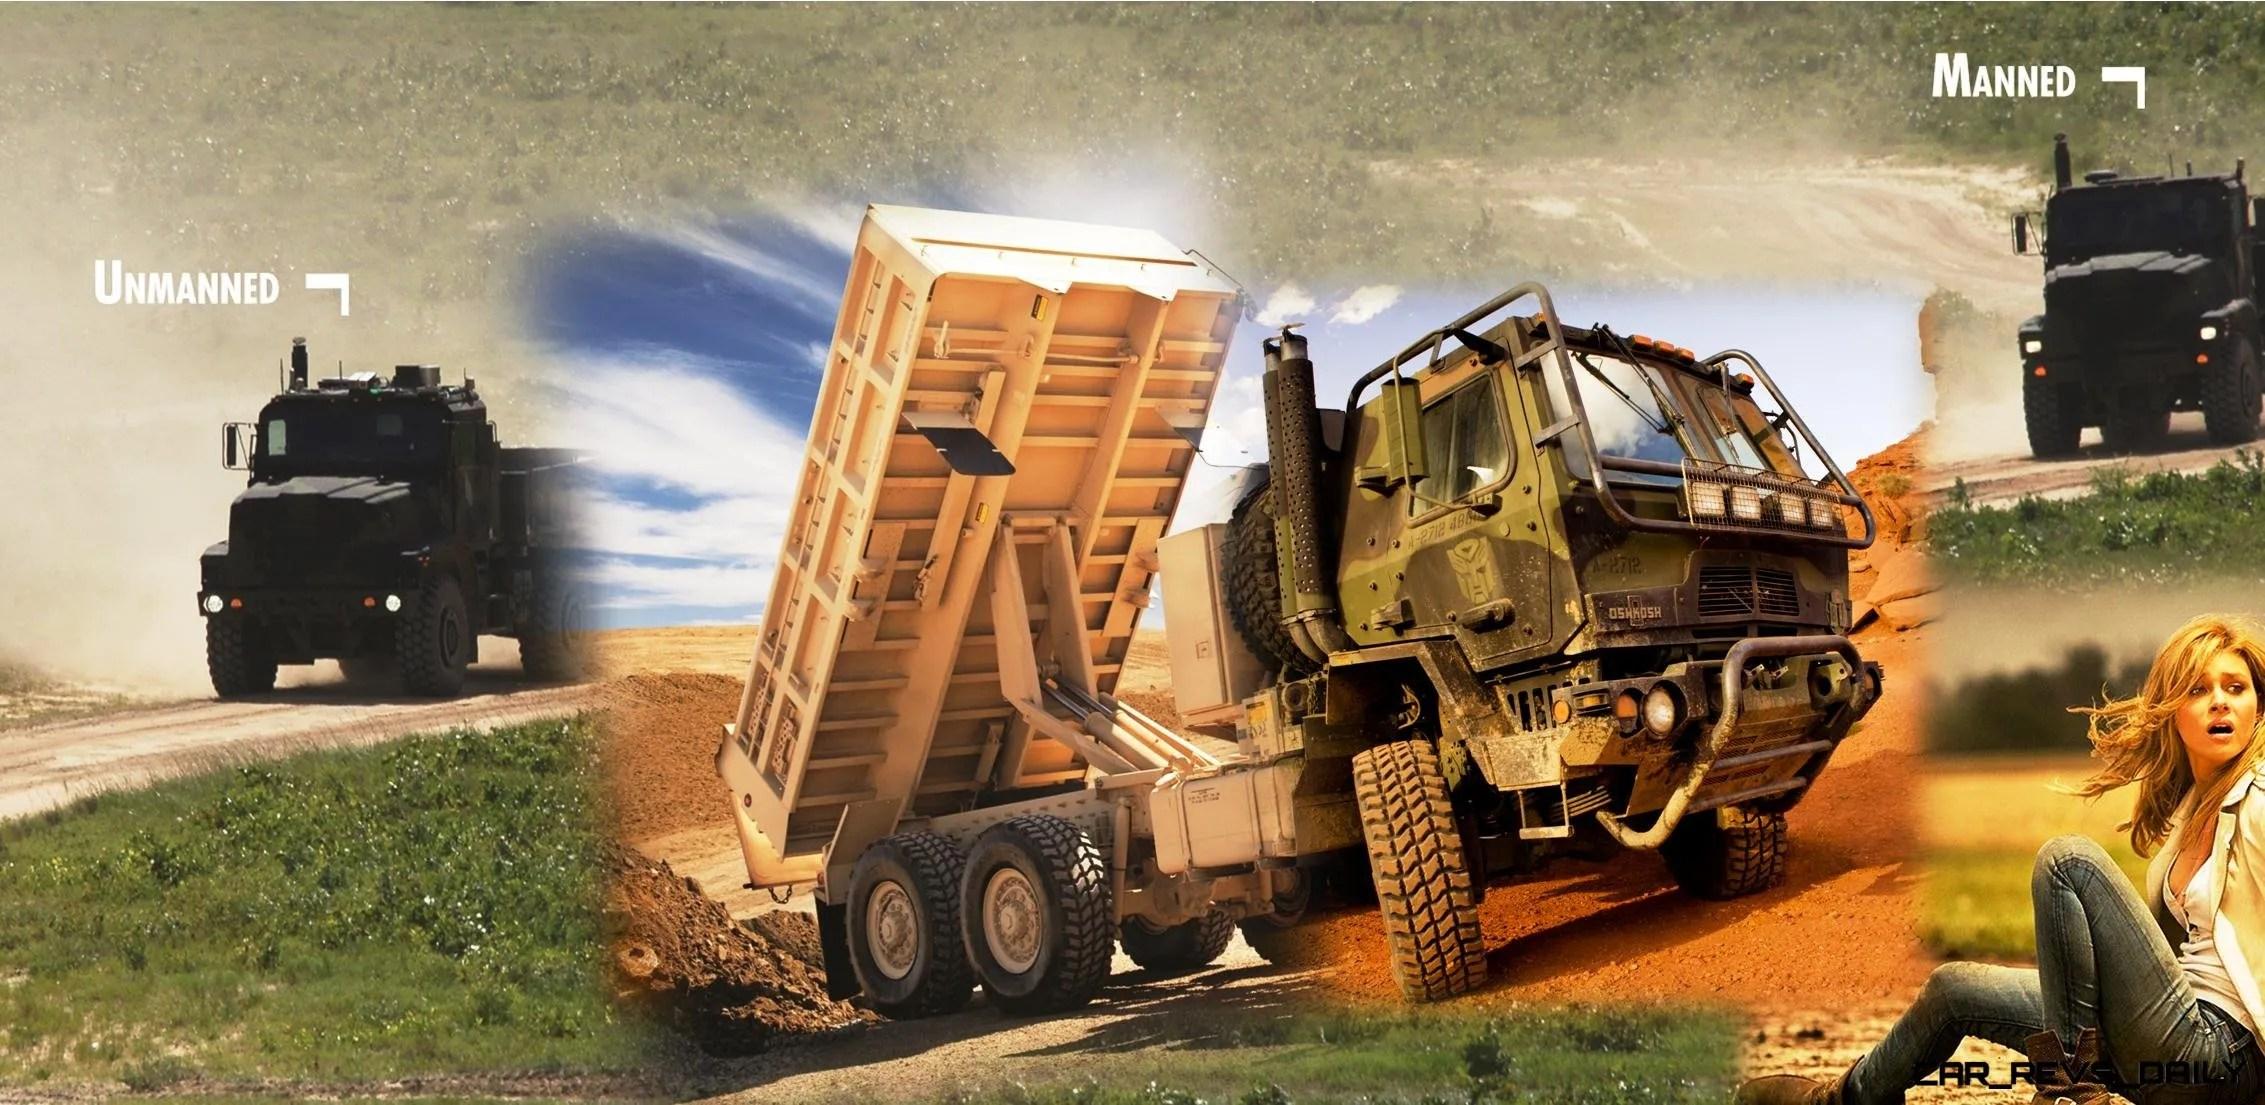 Oshkosh Transformers4 Header graphic